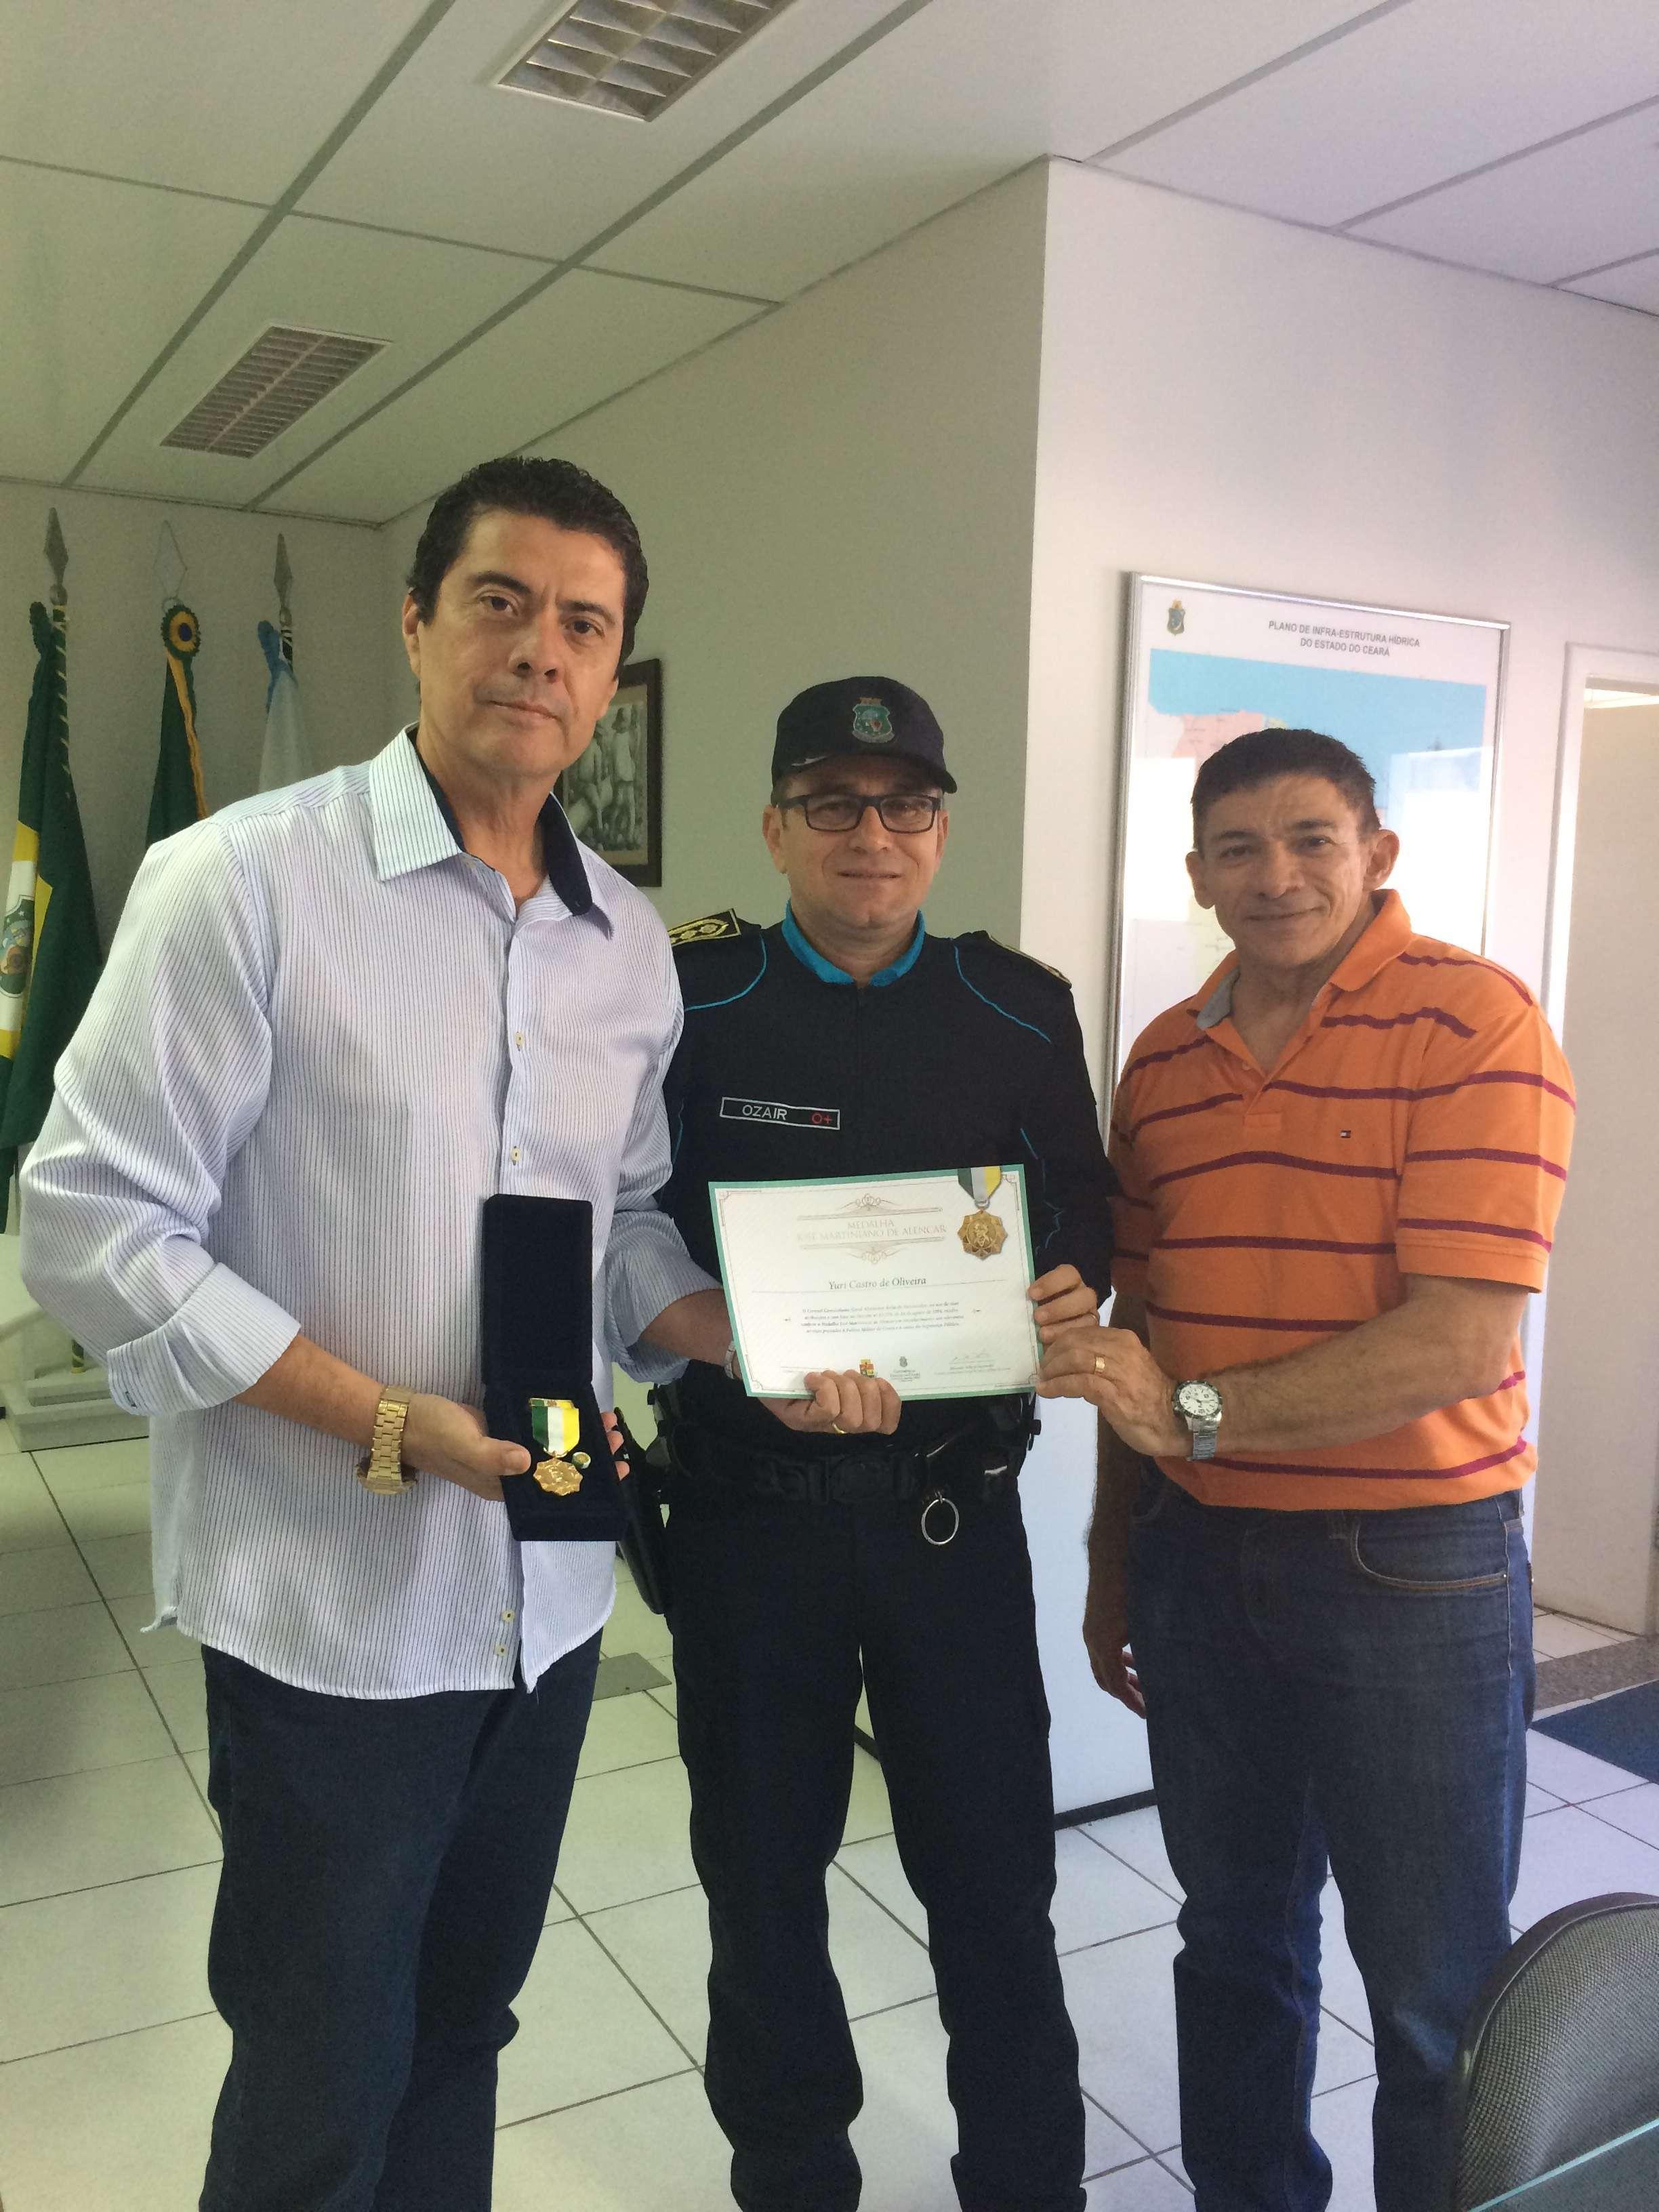 O Superintendente da SOHIDRA recebeu do Subcomandante Geral da Polícia Militar do Ceará